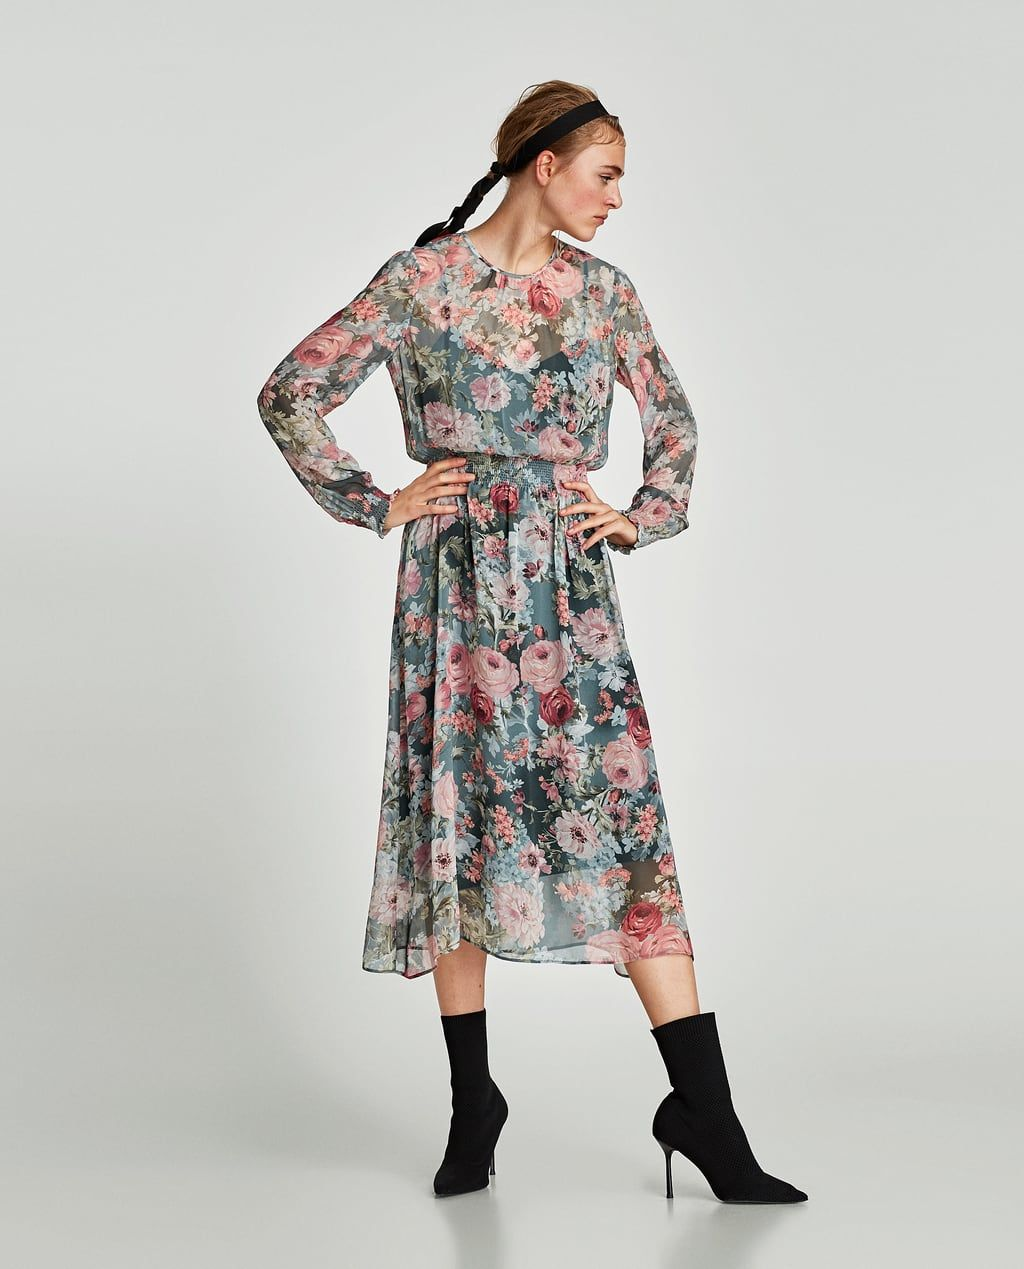 Dresses Woman All States Midi Printed Dress SaleZara View United XOkZuwPiT